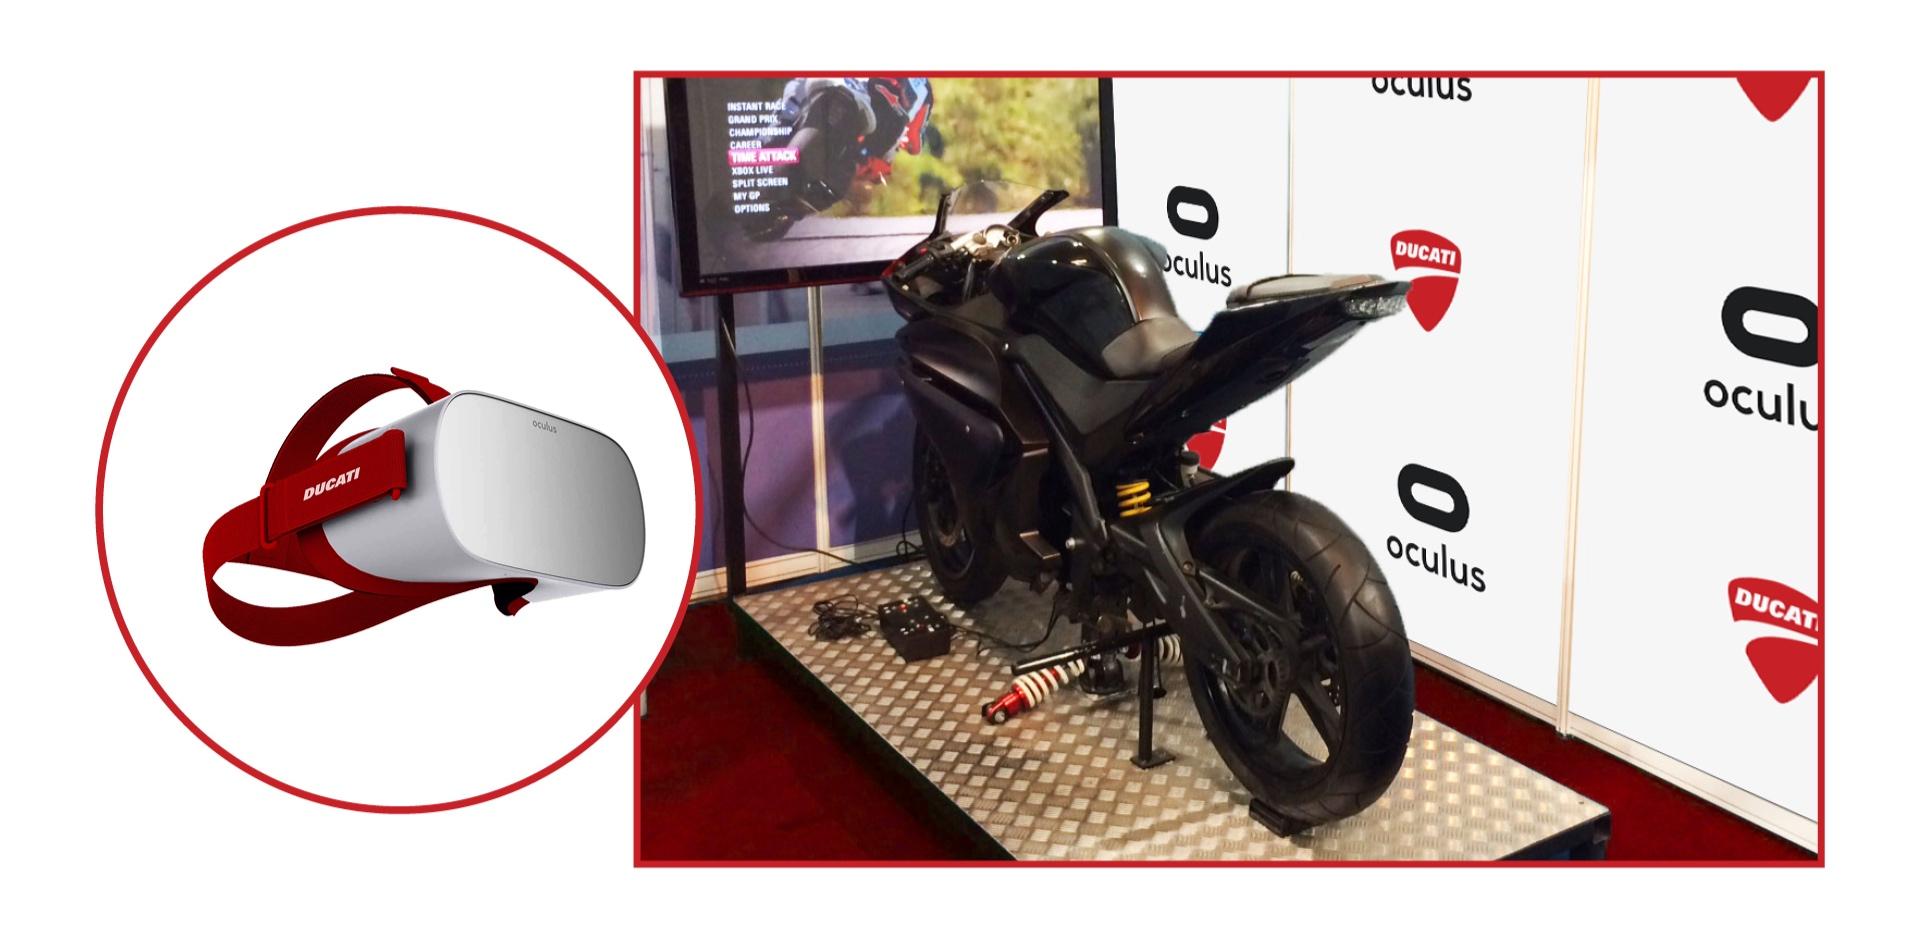 ducati-oculus-bike3.jpg